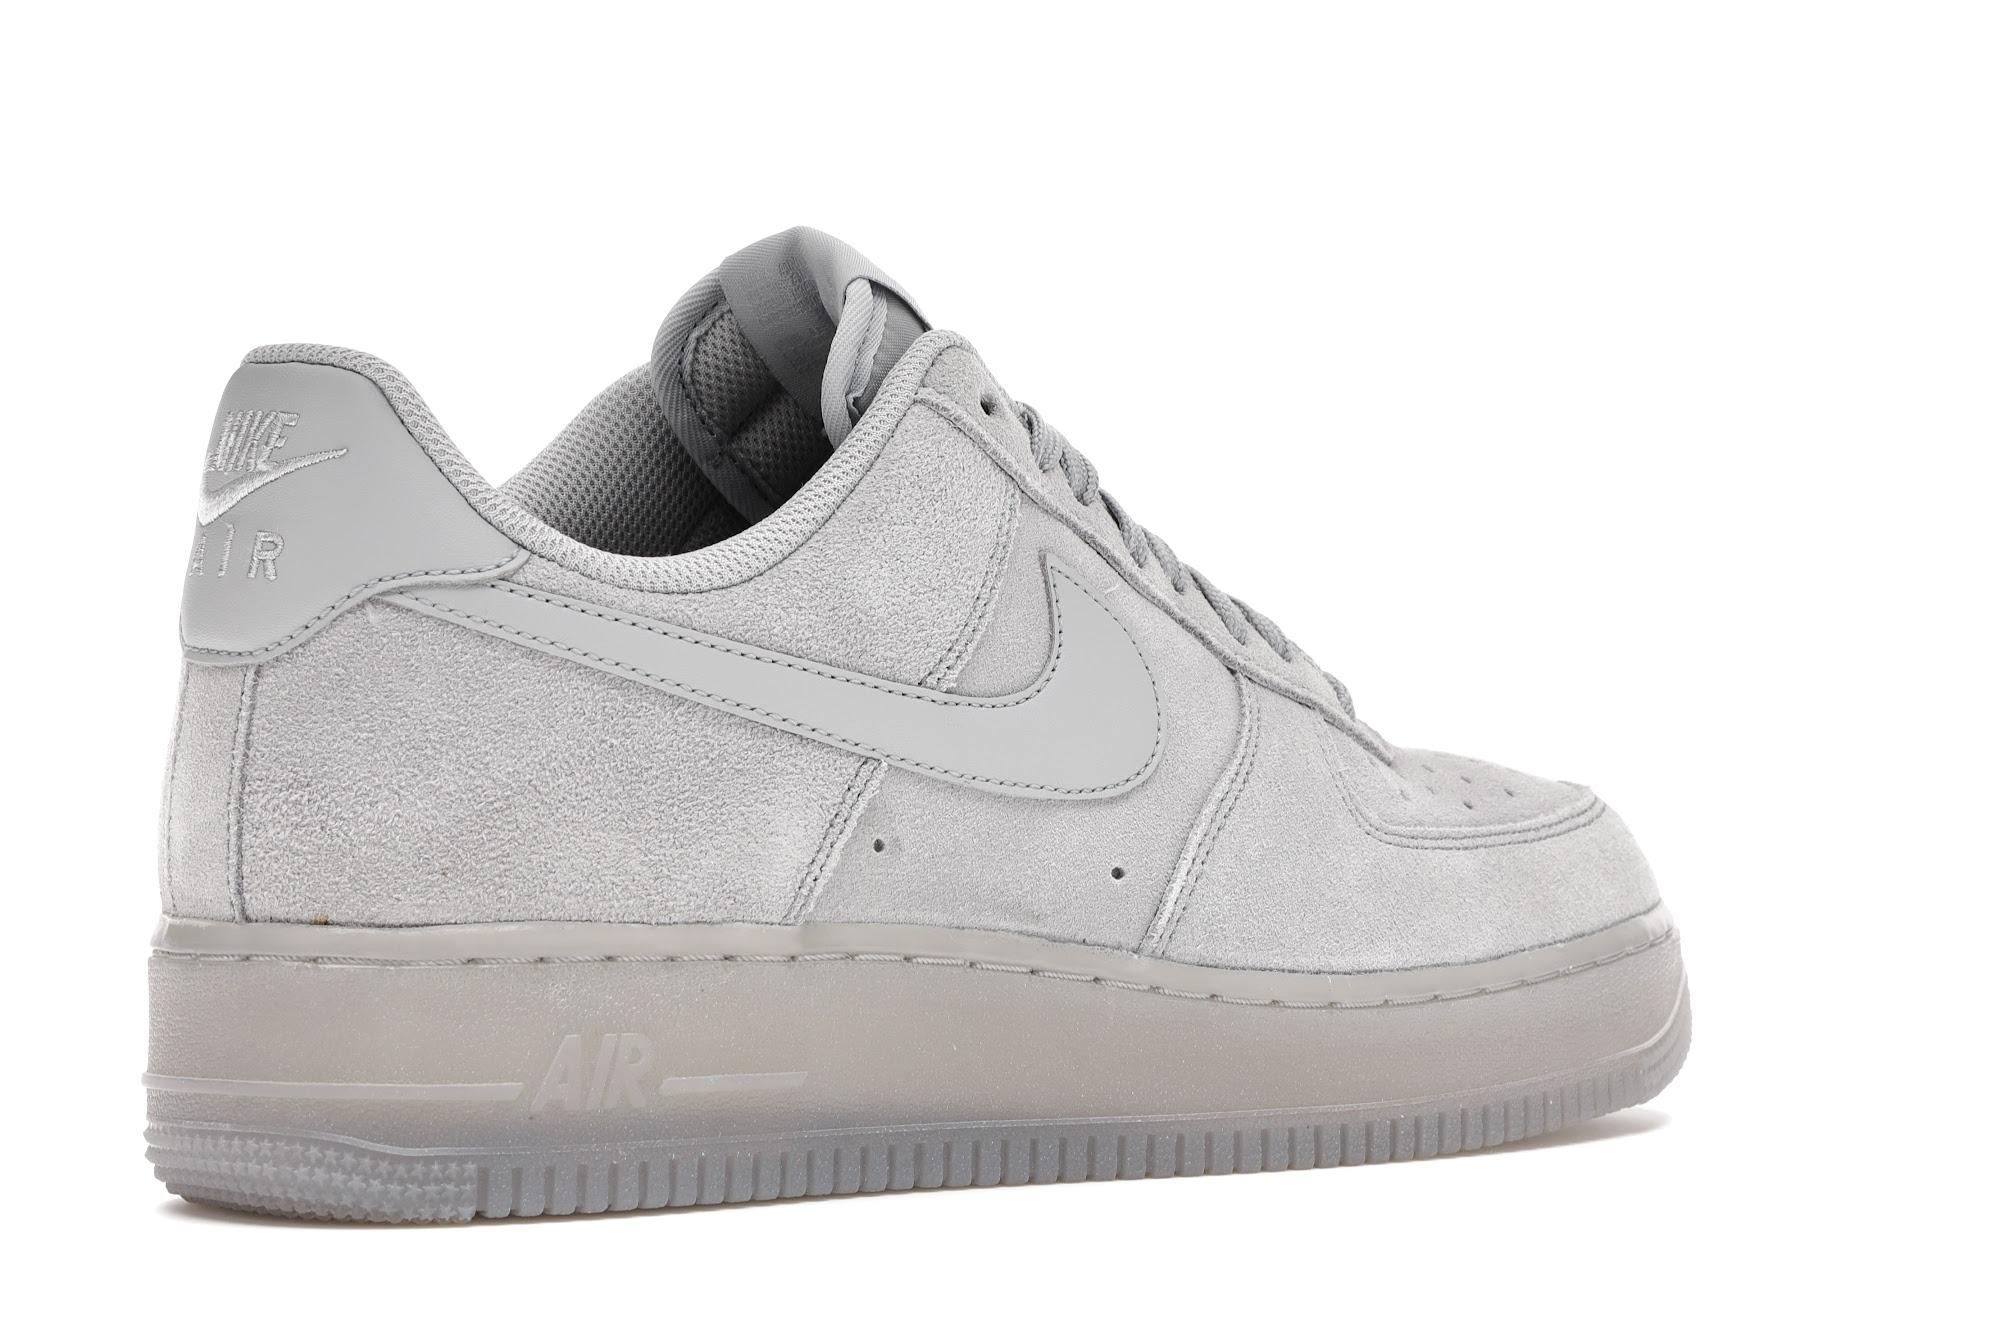 Nike Air Force 1 '07 LV8 Grey Suede - BQ4329-001